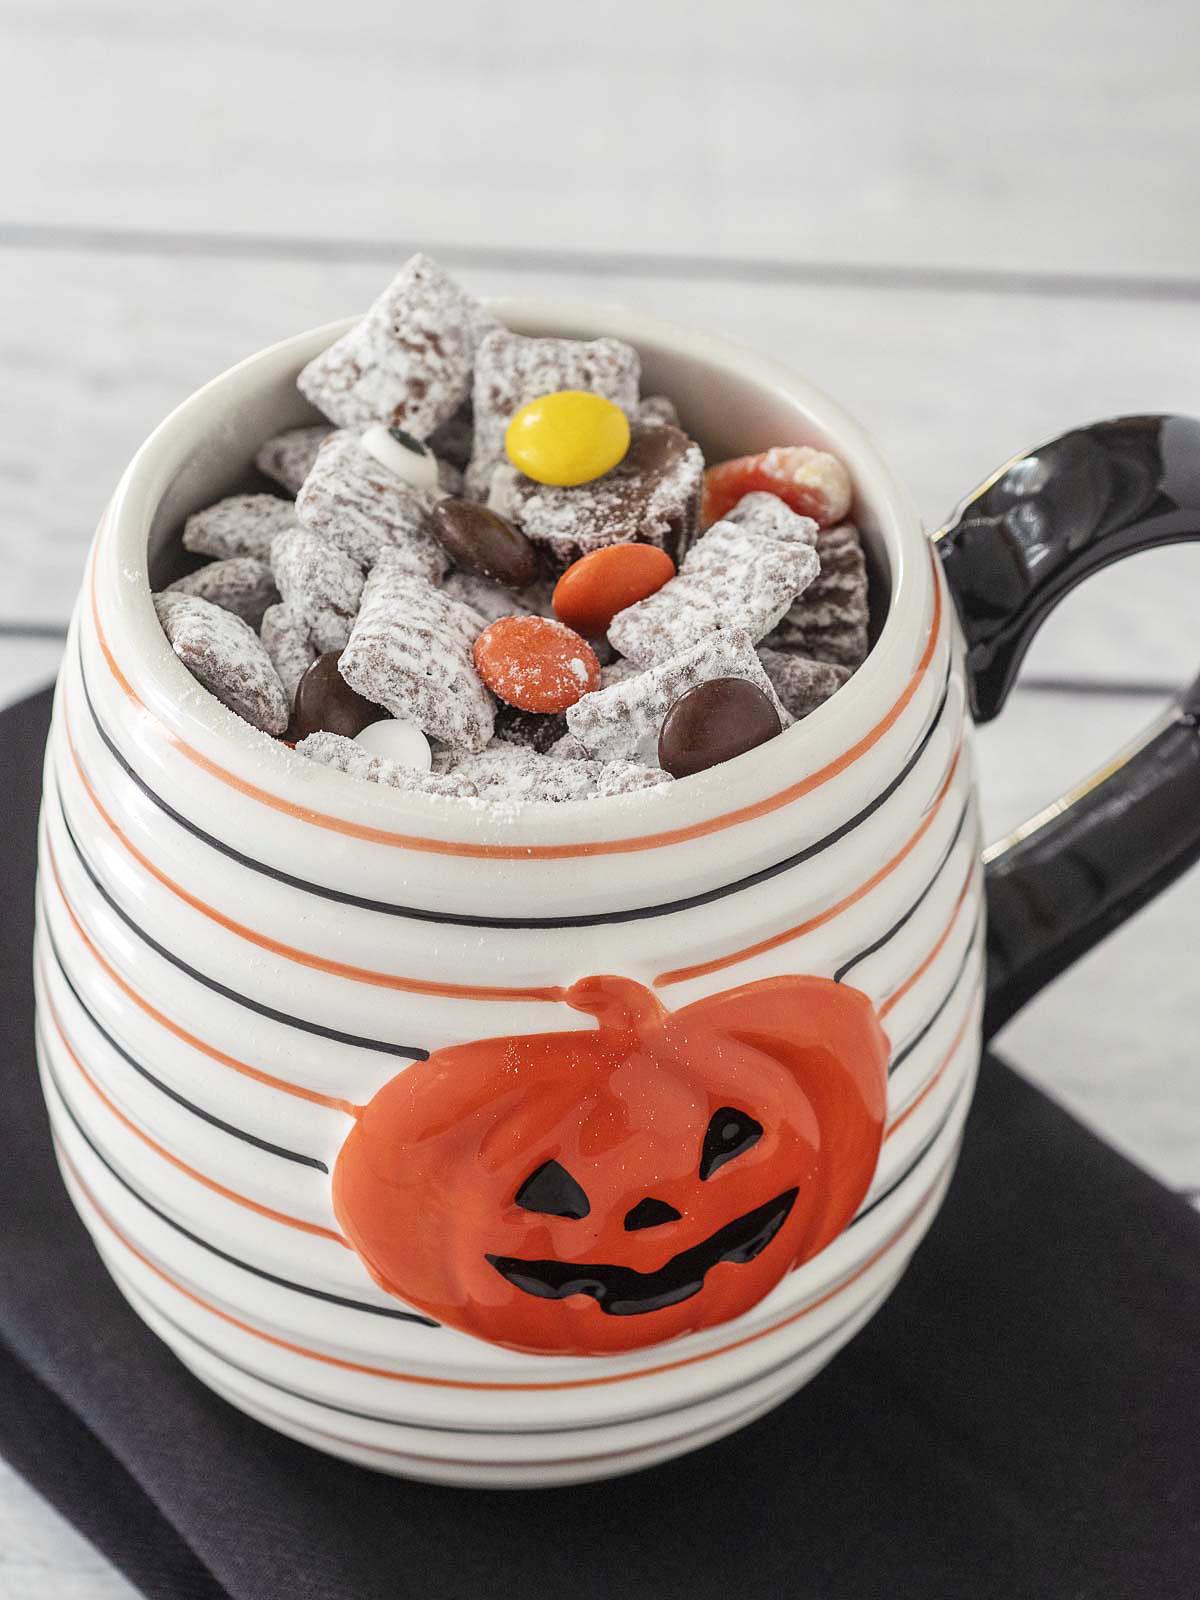 A white-with-black-and-orange striped jack-o-lantern mug full of Halloween Muddy Buddies.